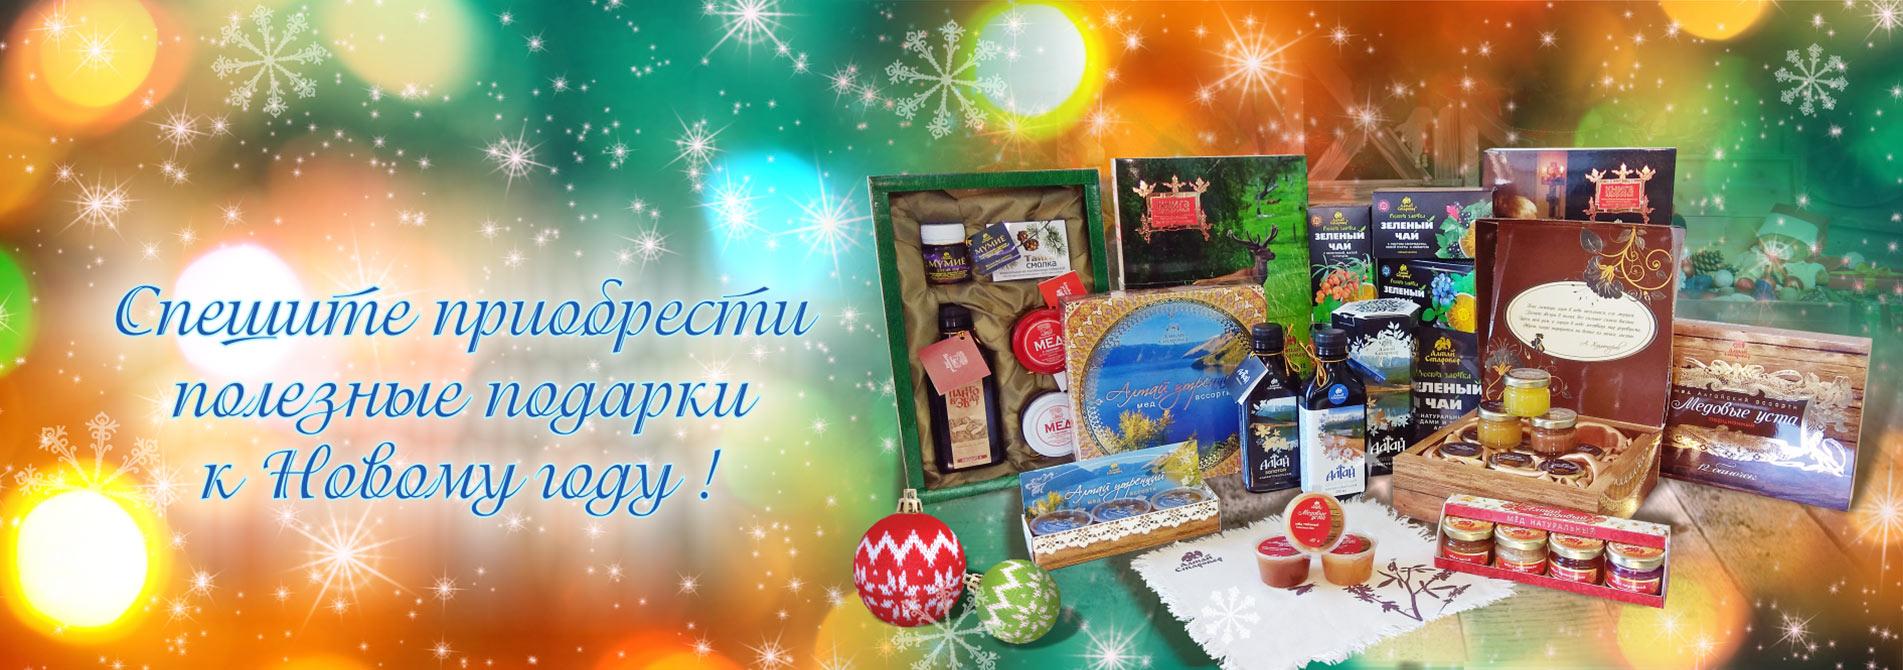 catalog/slides/01-noviigod.jpg